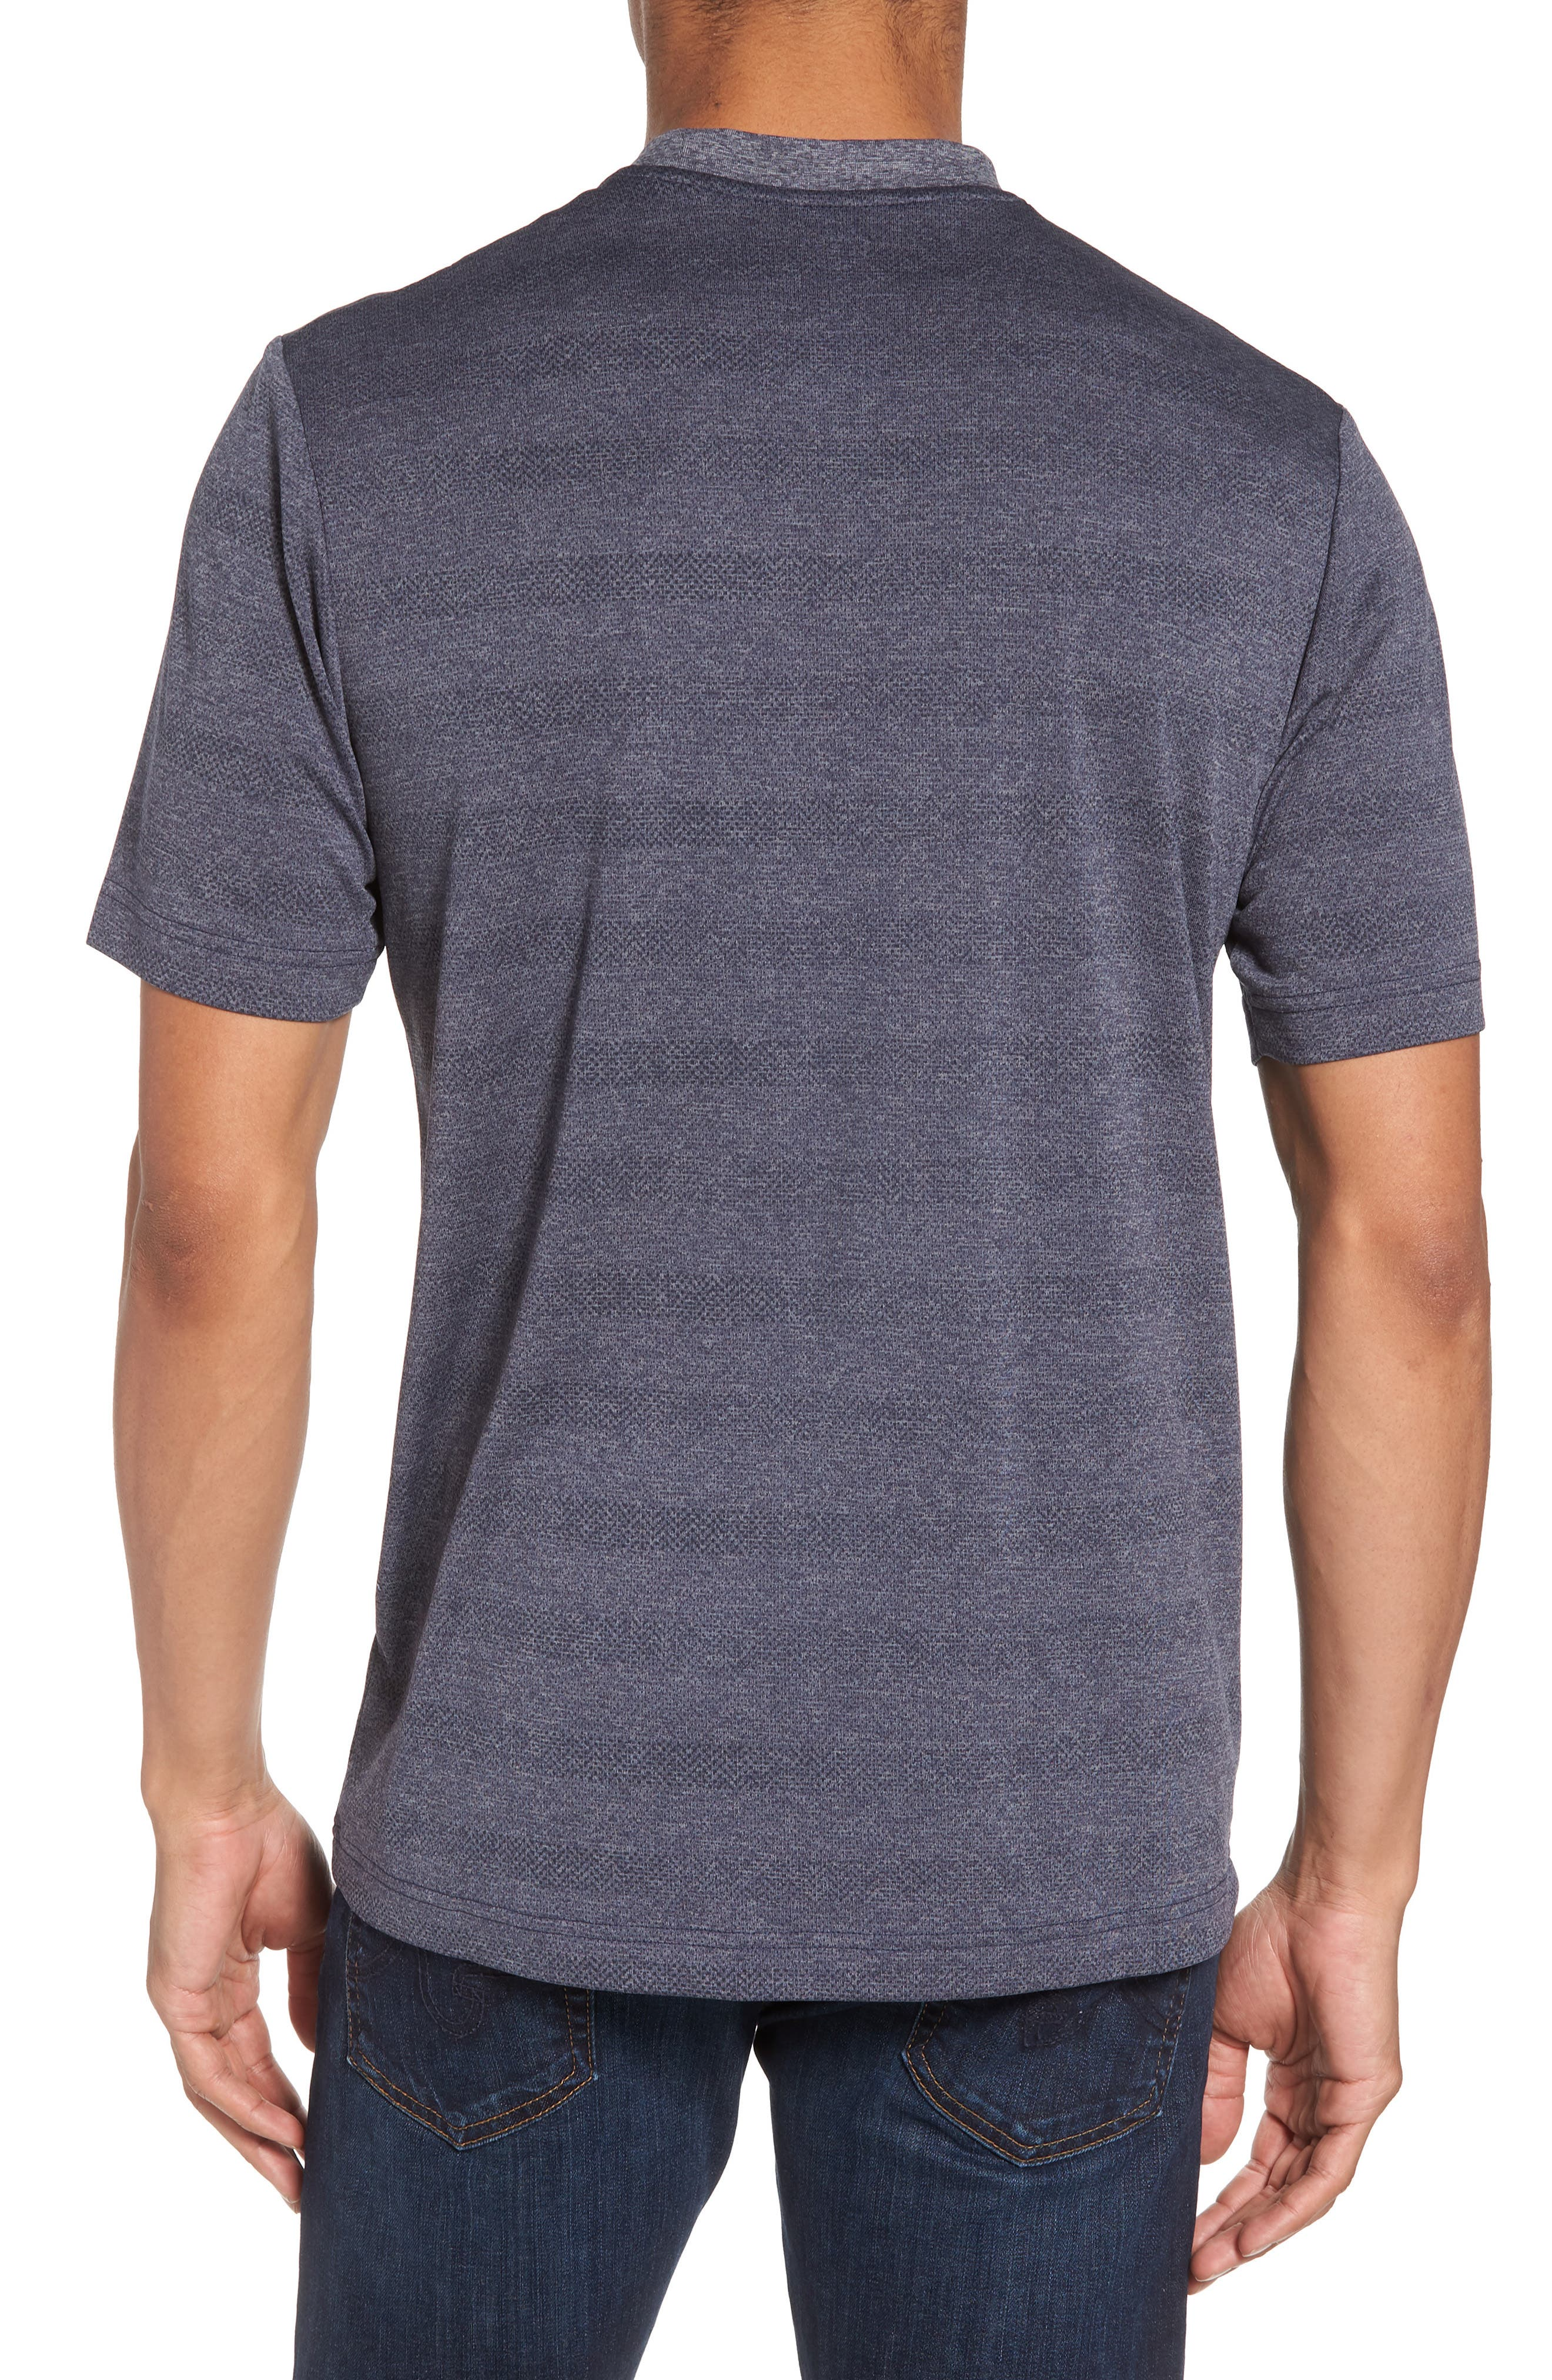 Upshift T-Shirt,                             Alternate thumbnail 2, color,                             HEATHER GRIFFIN